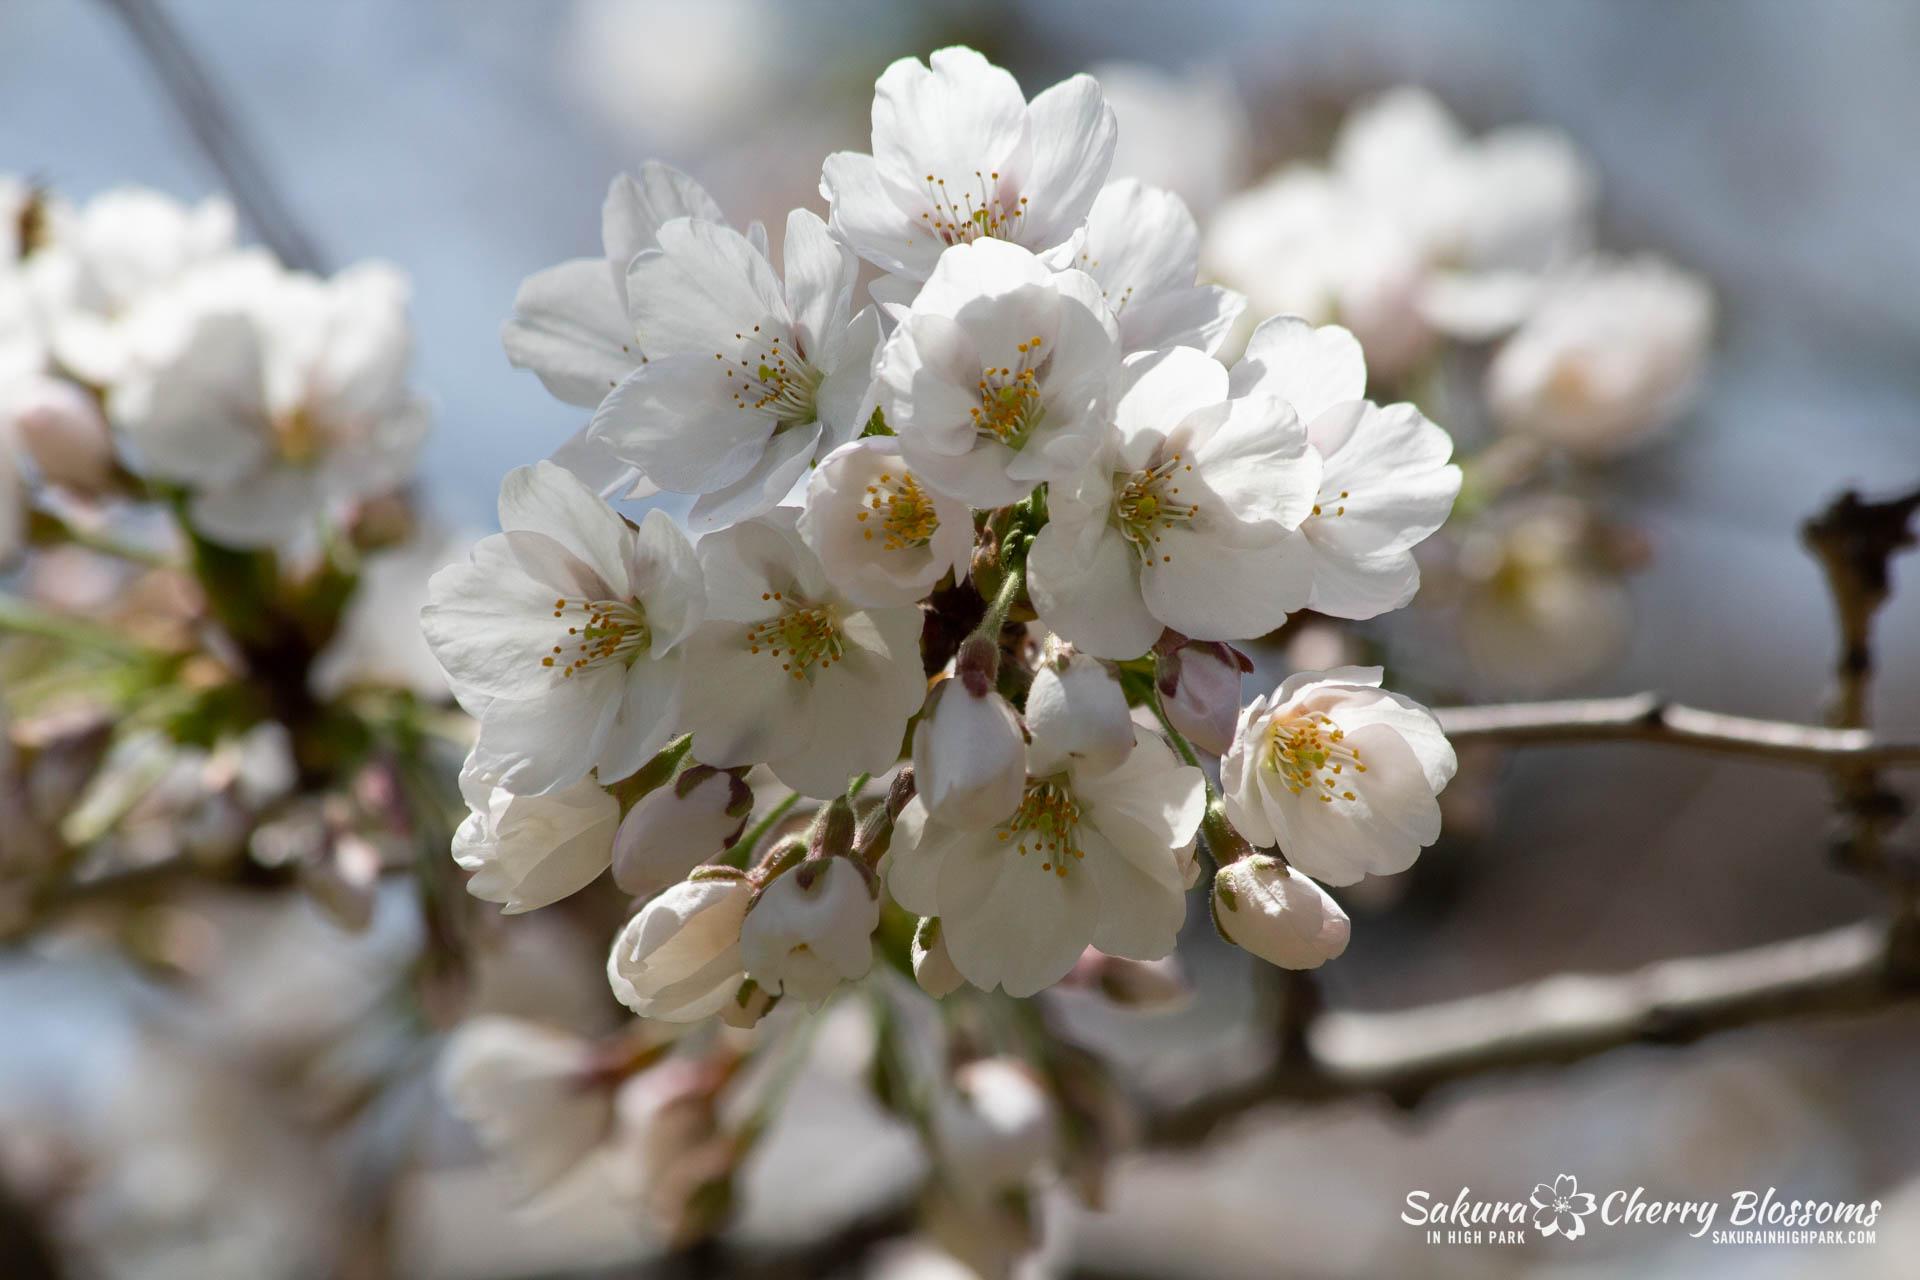 Sakura-Watch-May-5-2018-41.jpg